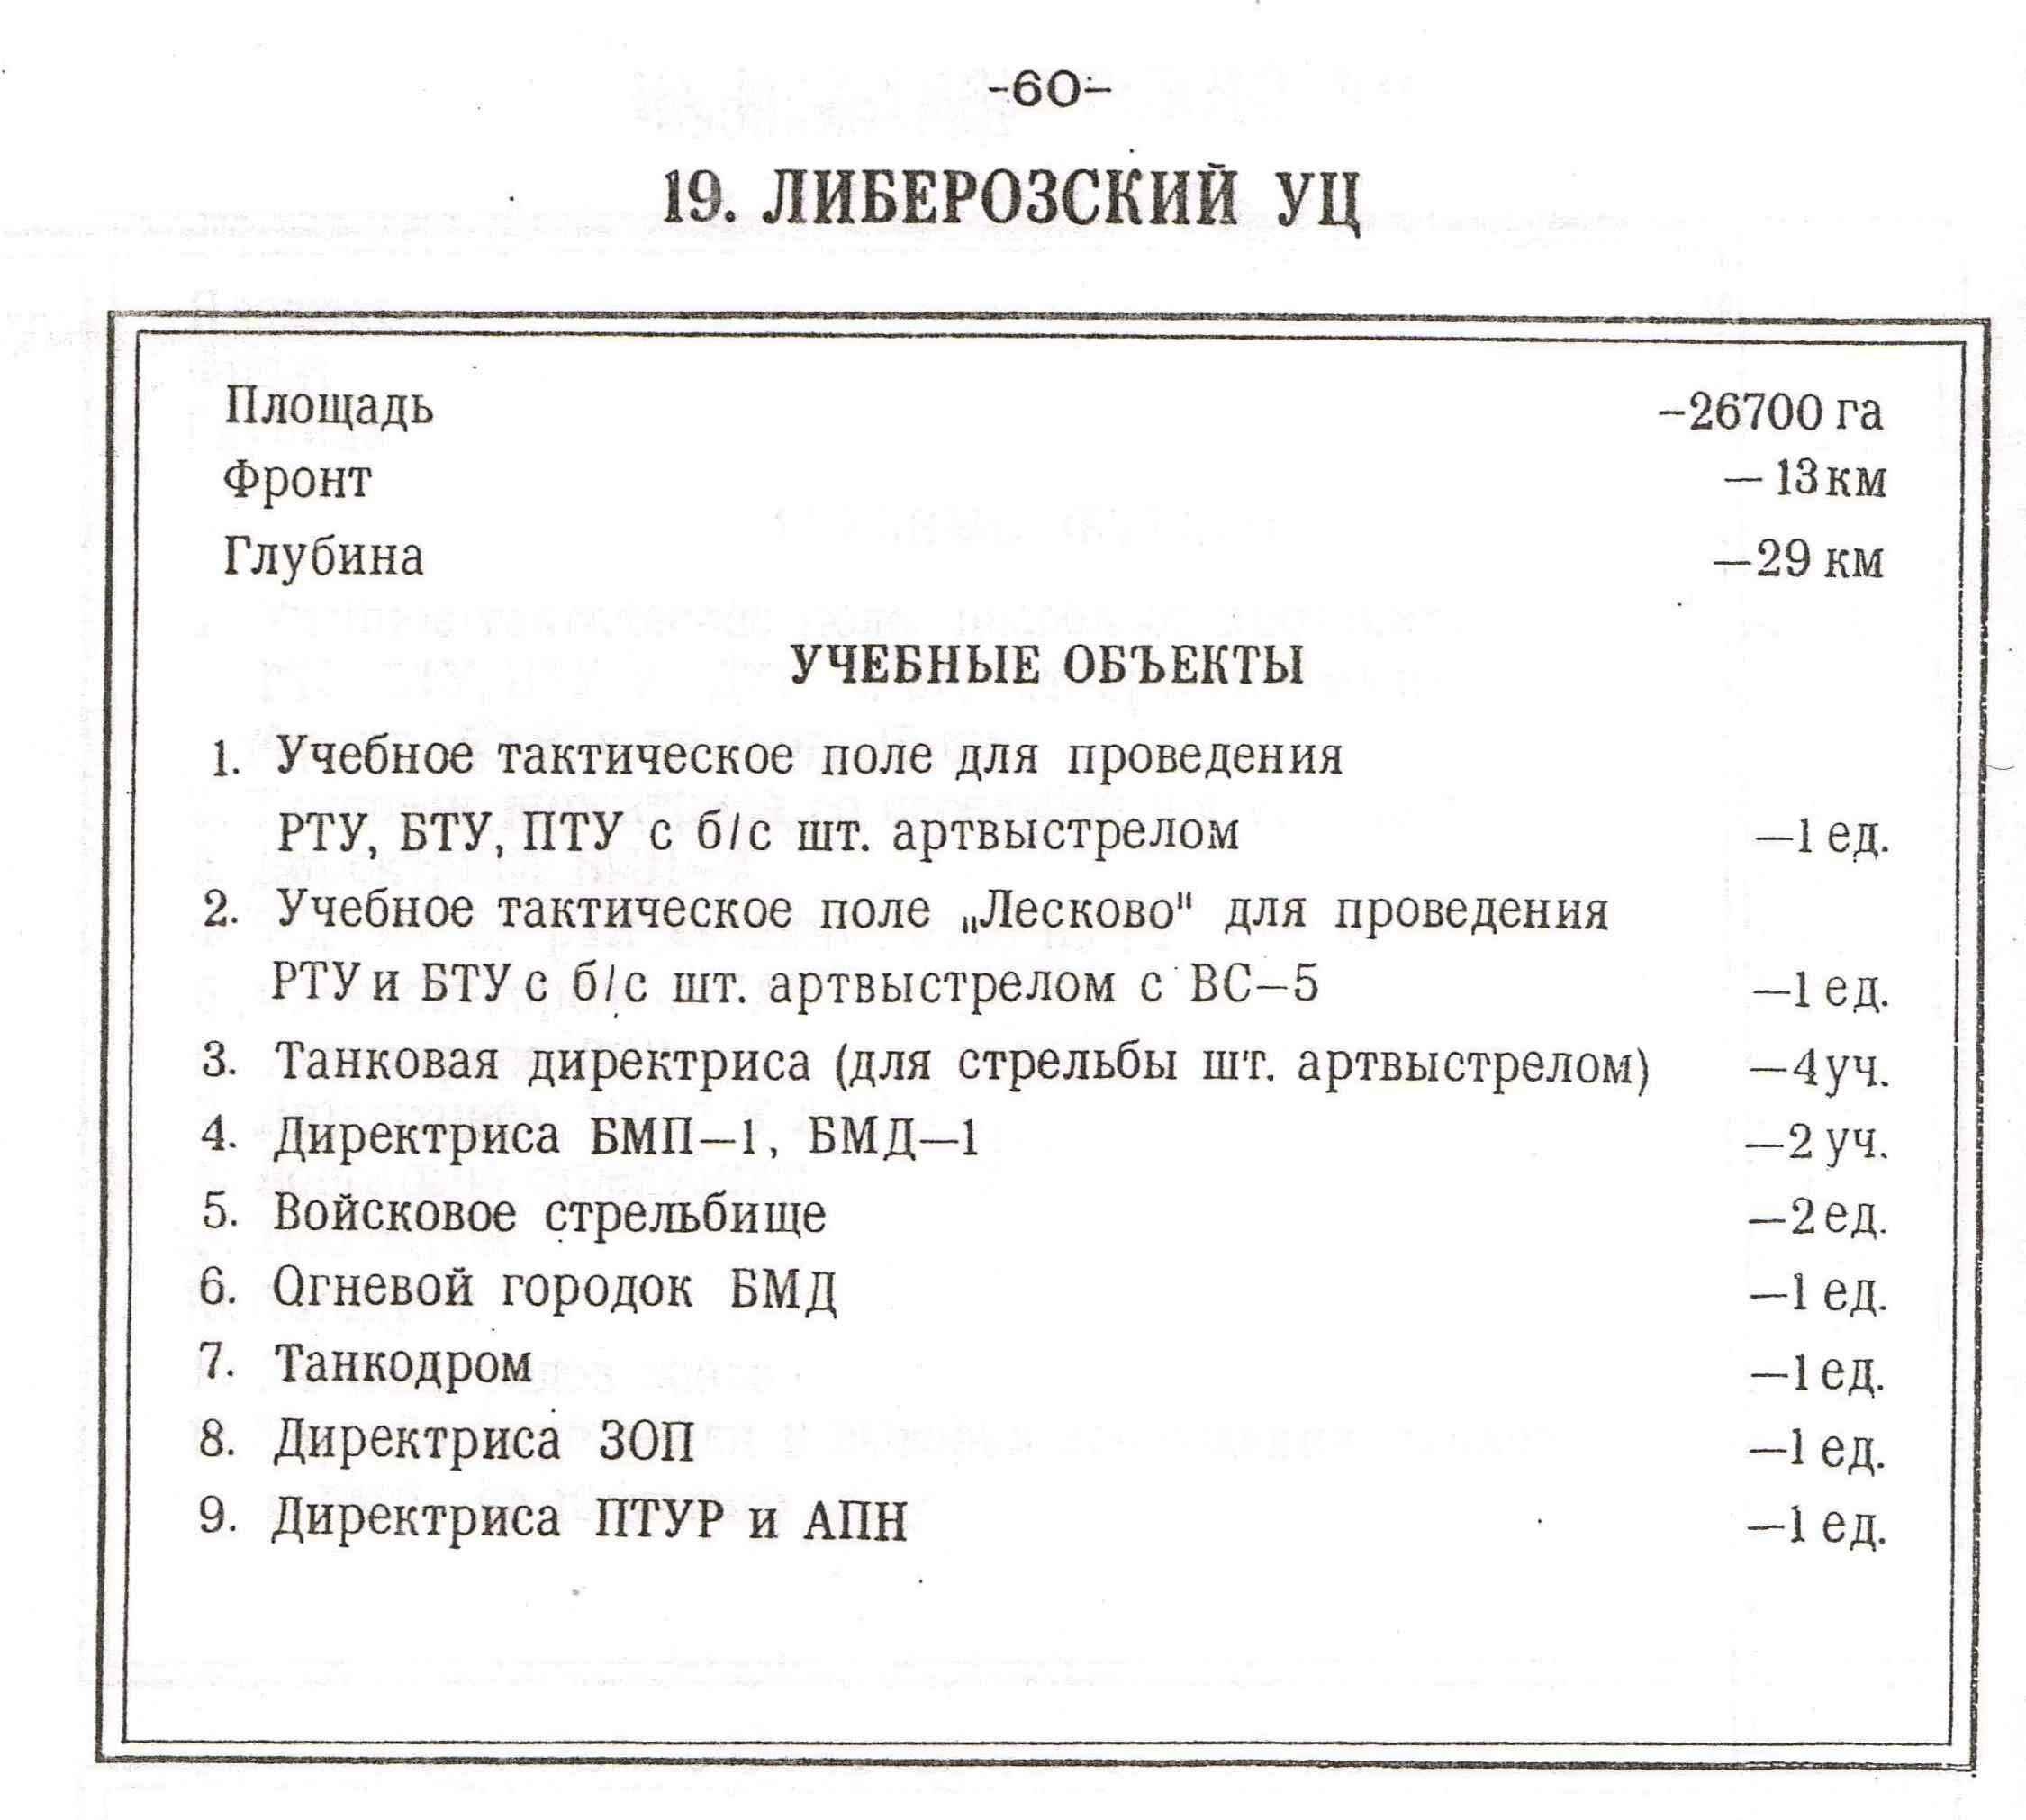 http://s2.uploads.ru/jKFJz.jpg